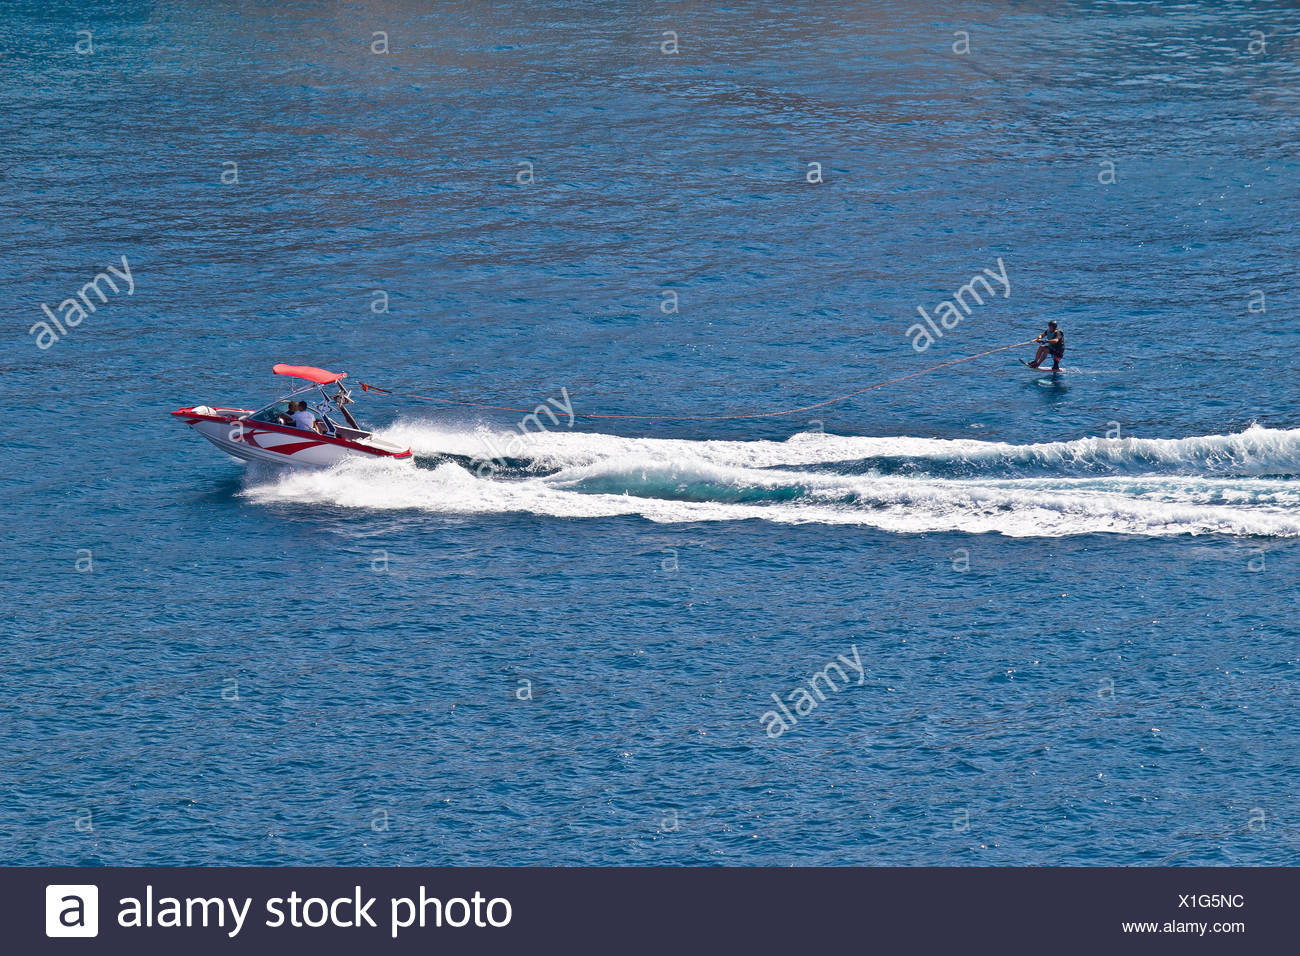 Asseoir hydroglisseur sport ski Photo Stock